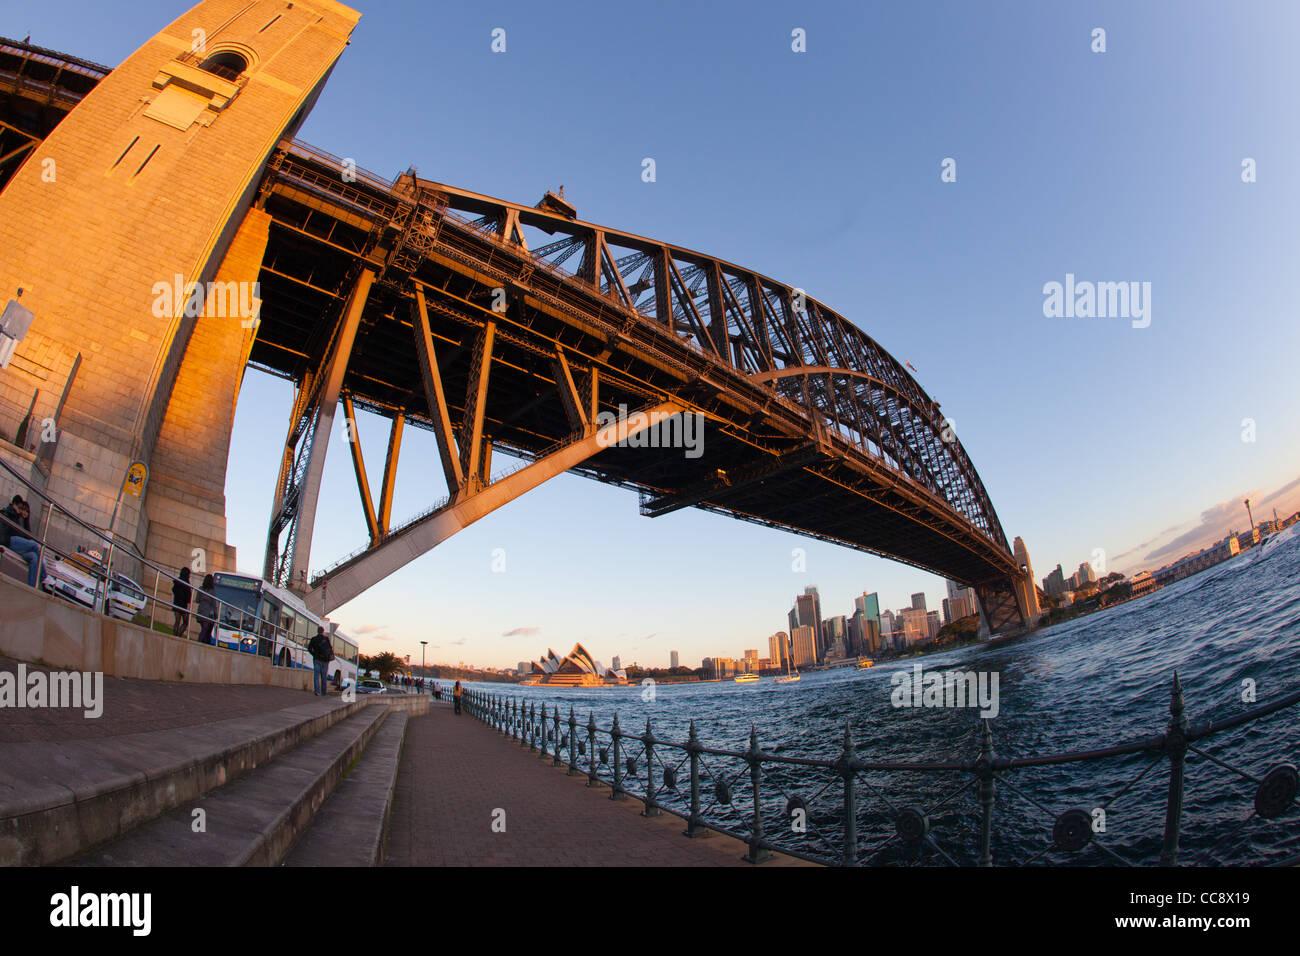 Sydney Harbour Bridge from Kirribilli - Stock Image